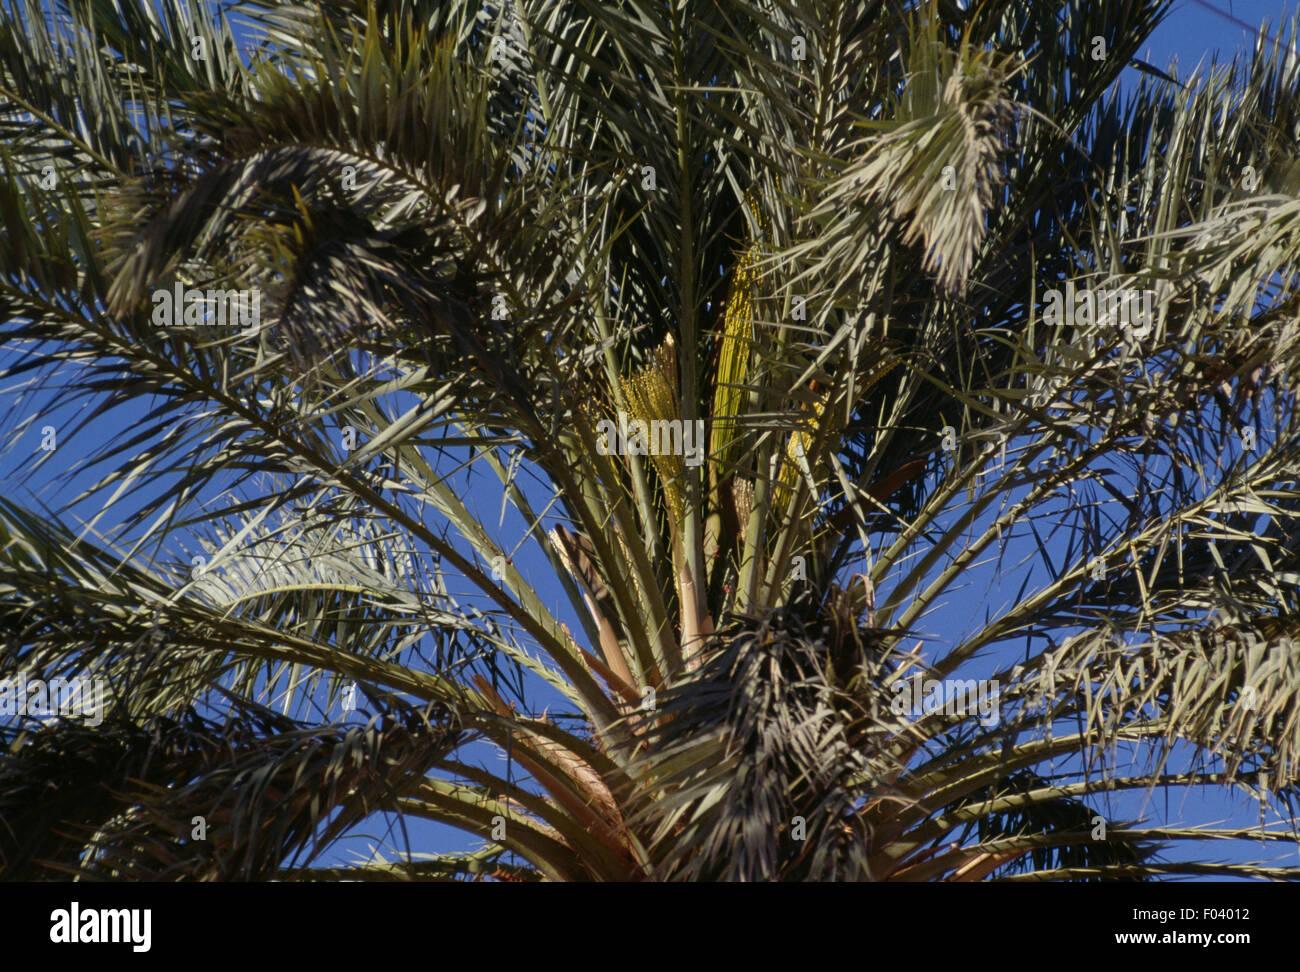 Date palm tree (Phoenix dactylifera), Al-Mani'a or El Golea oasis, Algeria. Stock Photo